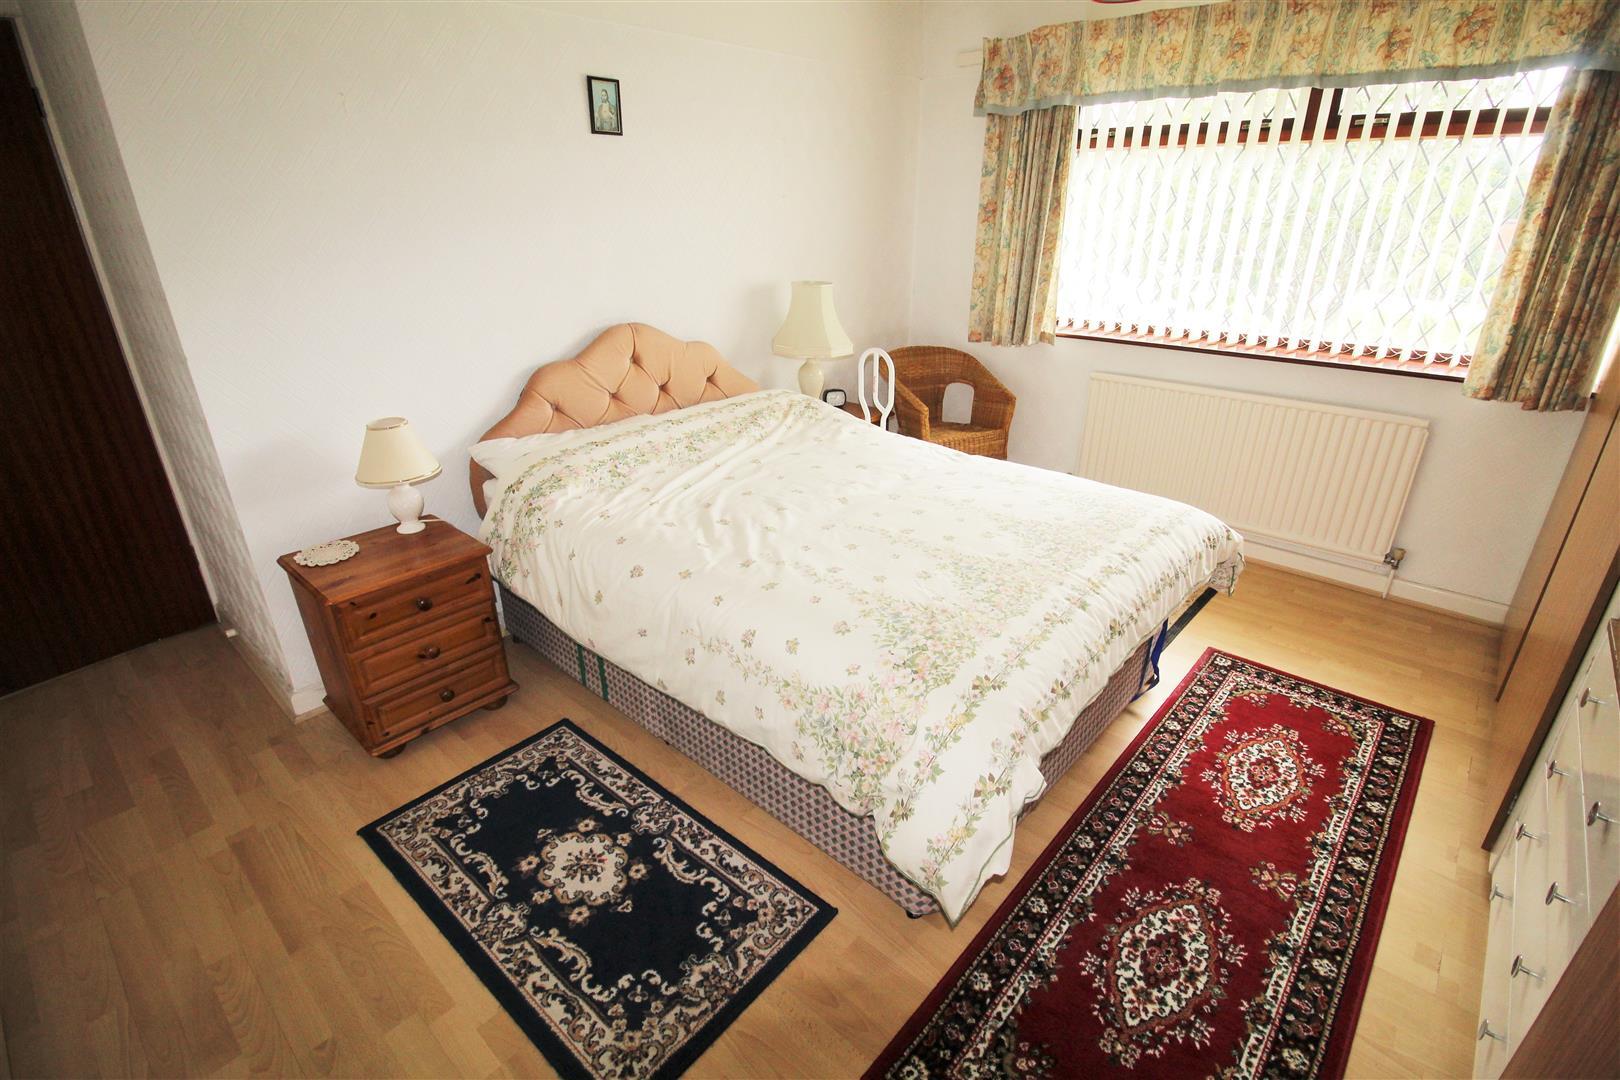 3 Bedrooms, House - Semi-Detached, Aintree Lane, Liverpool